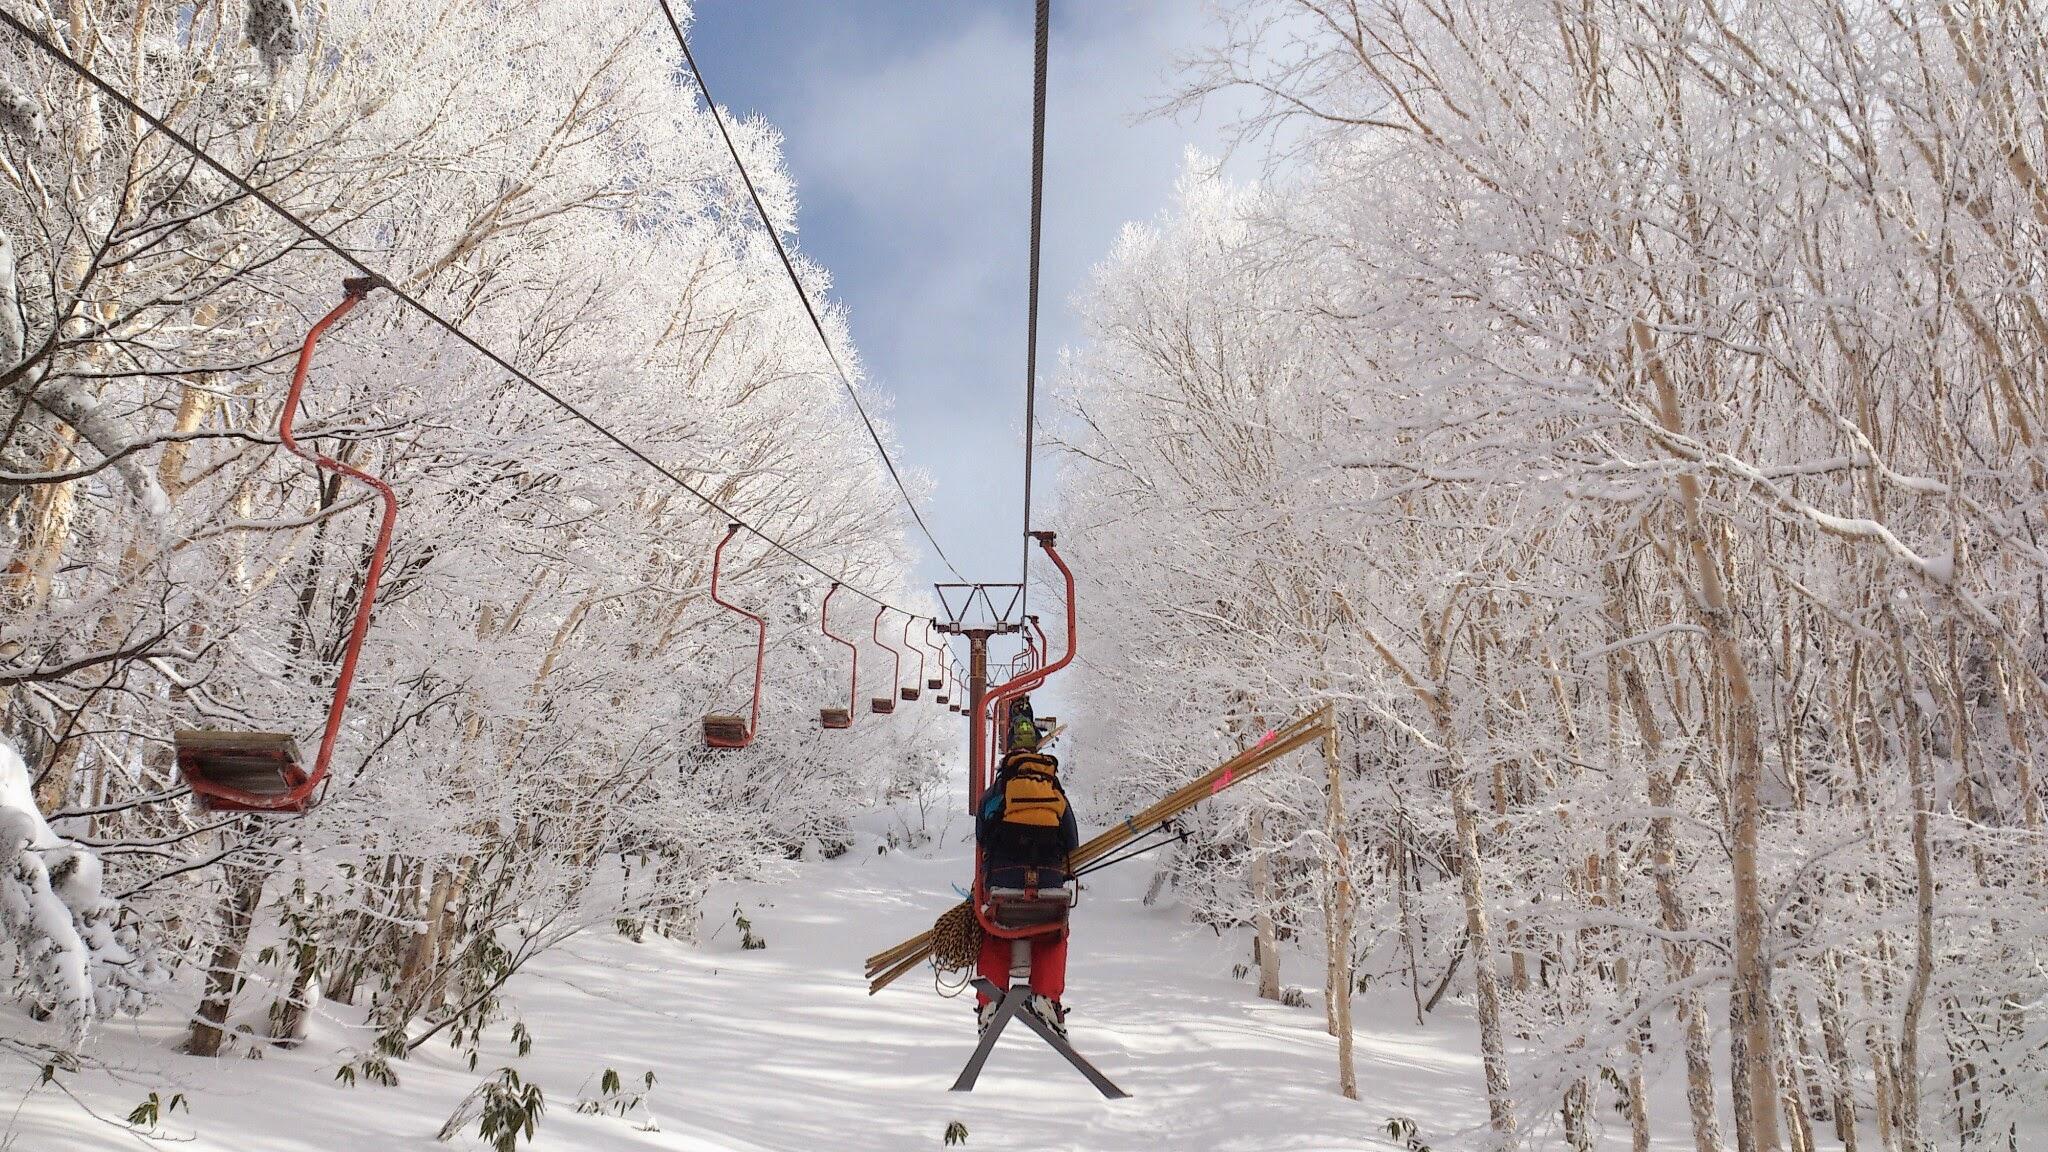 White heights, Yamaboku Wild Snow Park